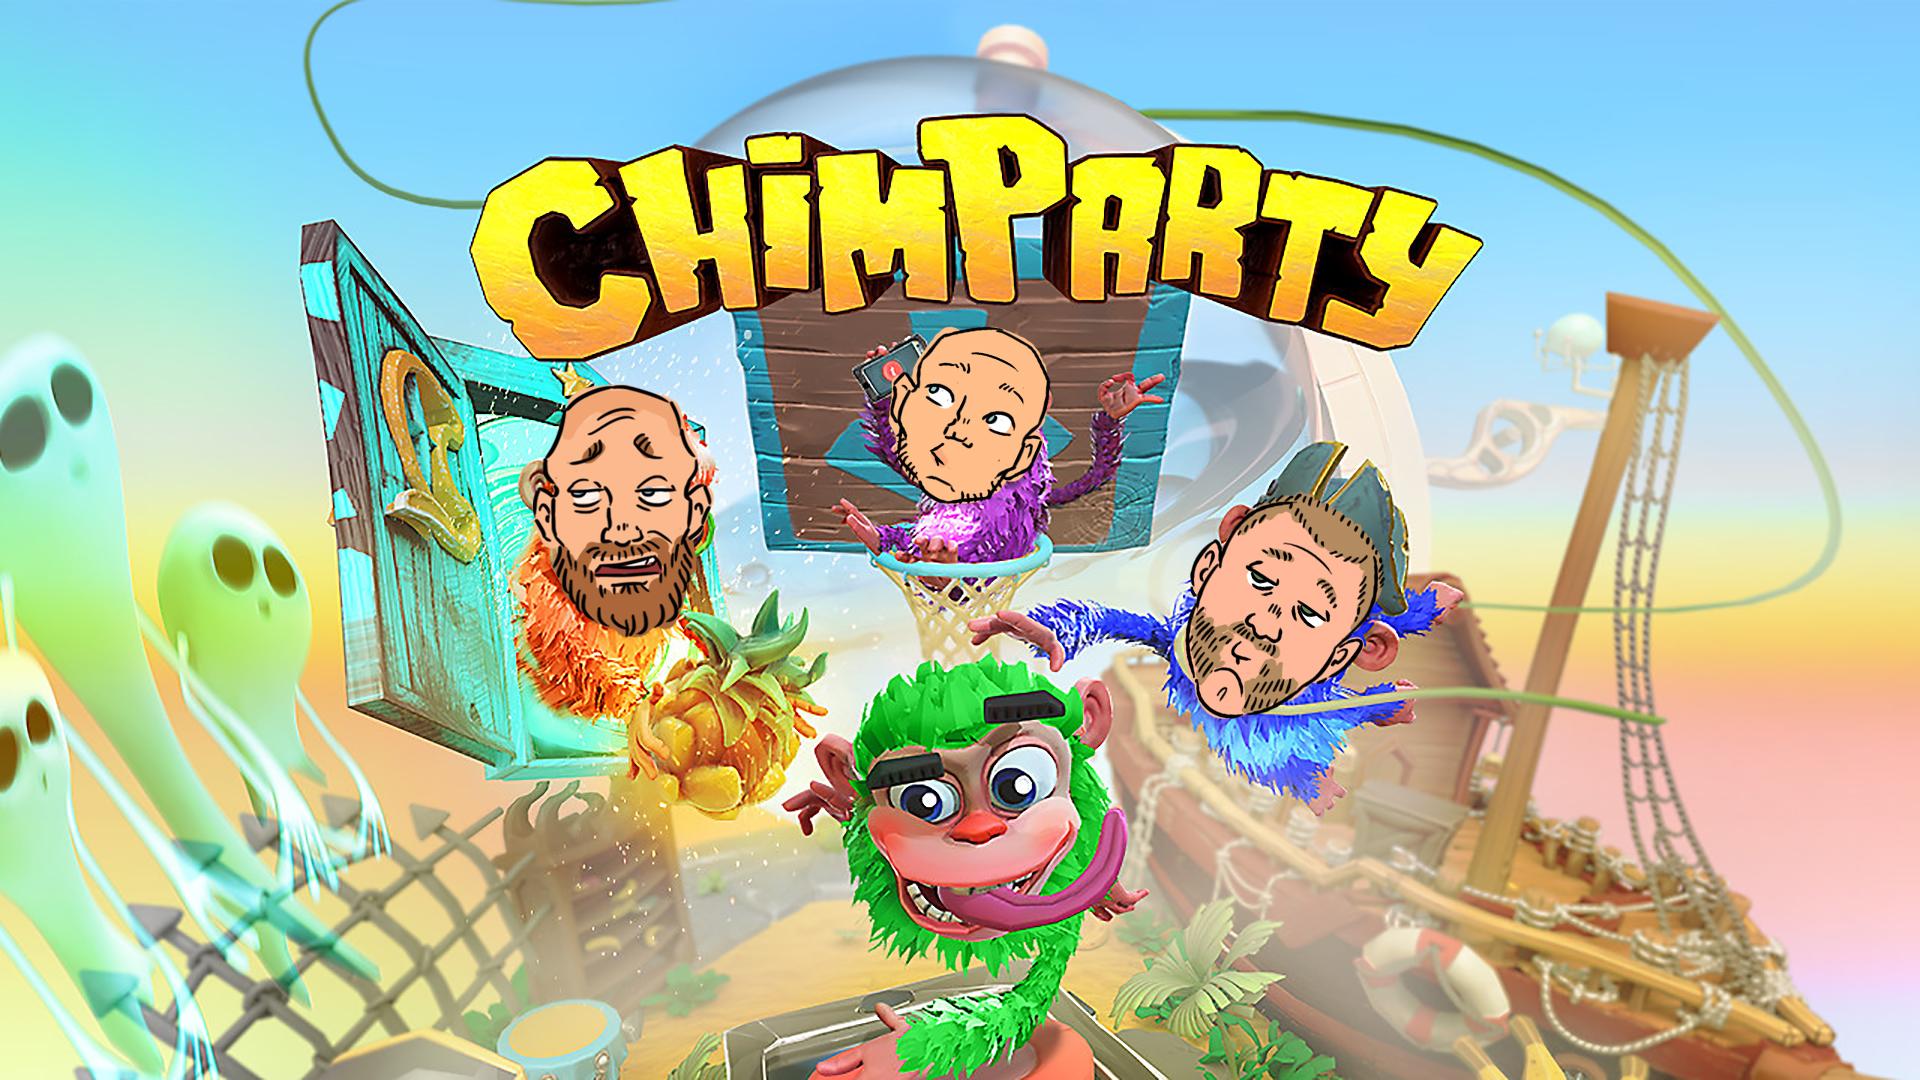 Quicktitt: Chimparty (PS4)